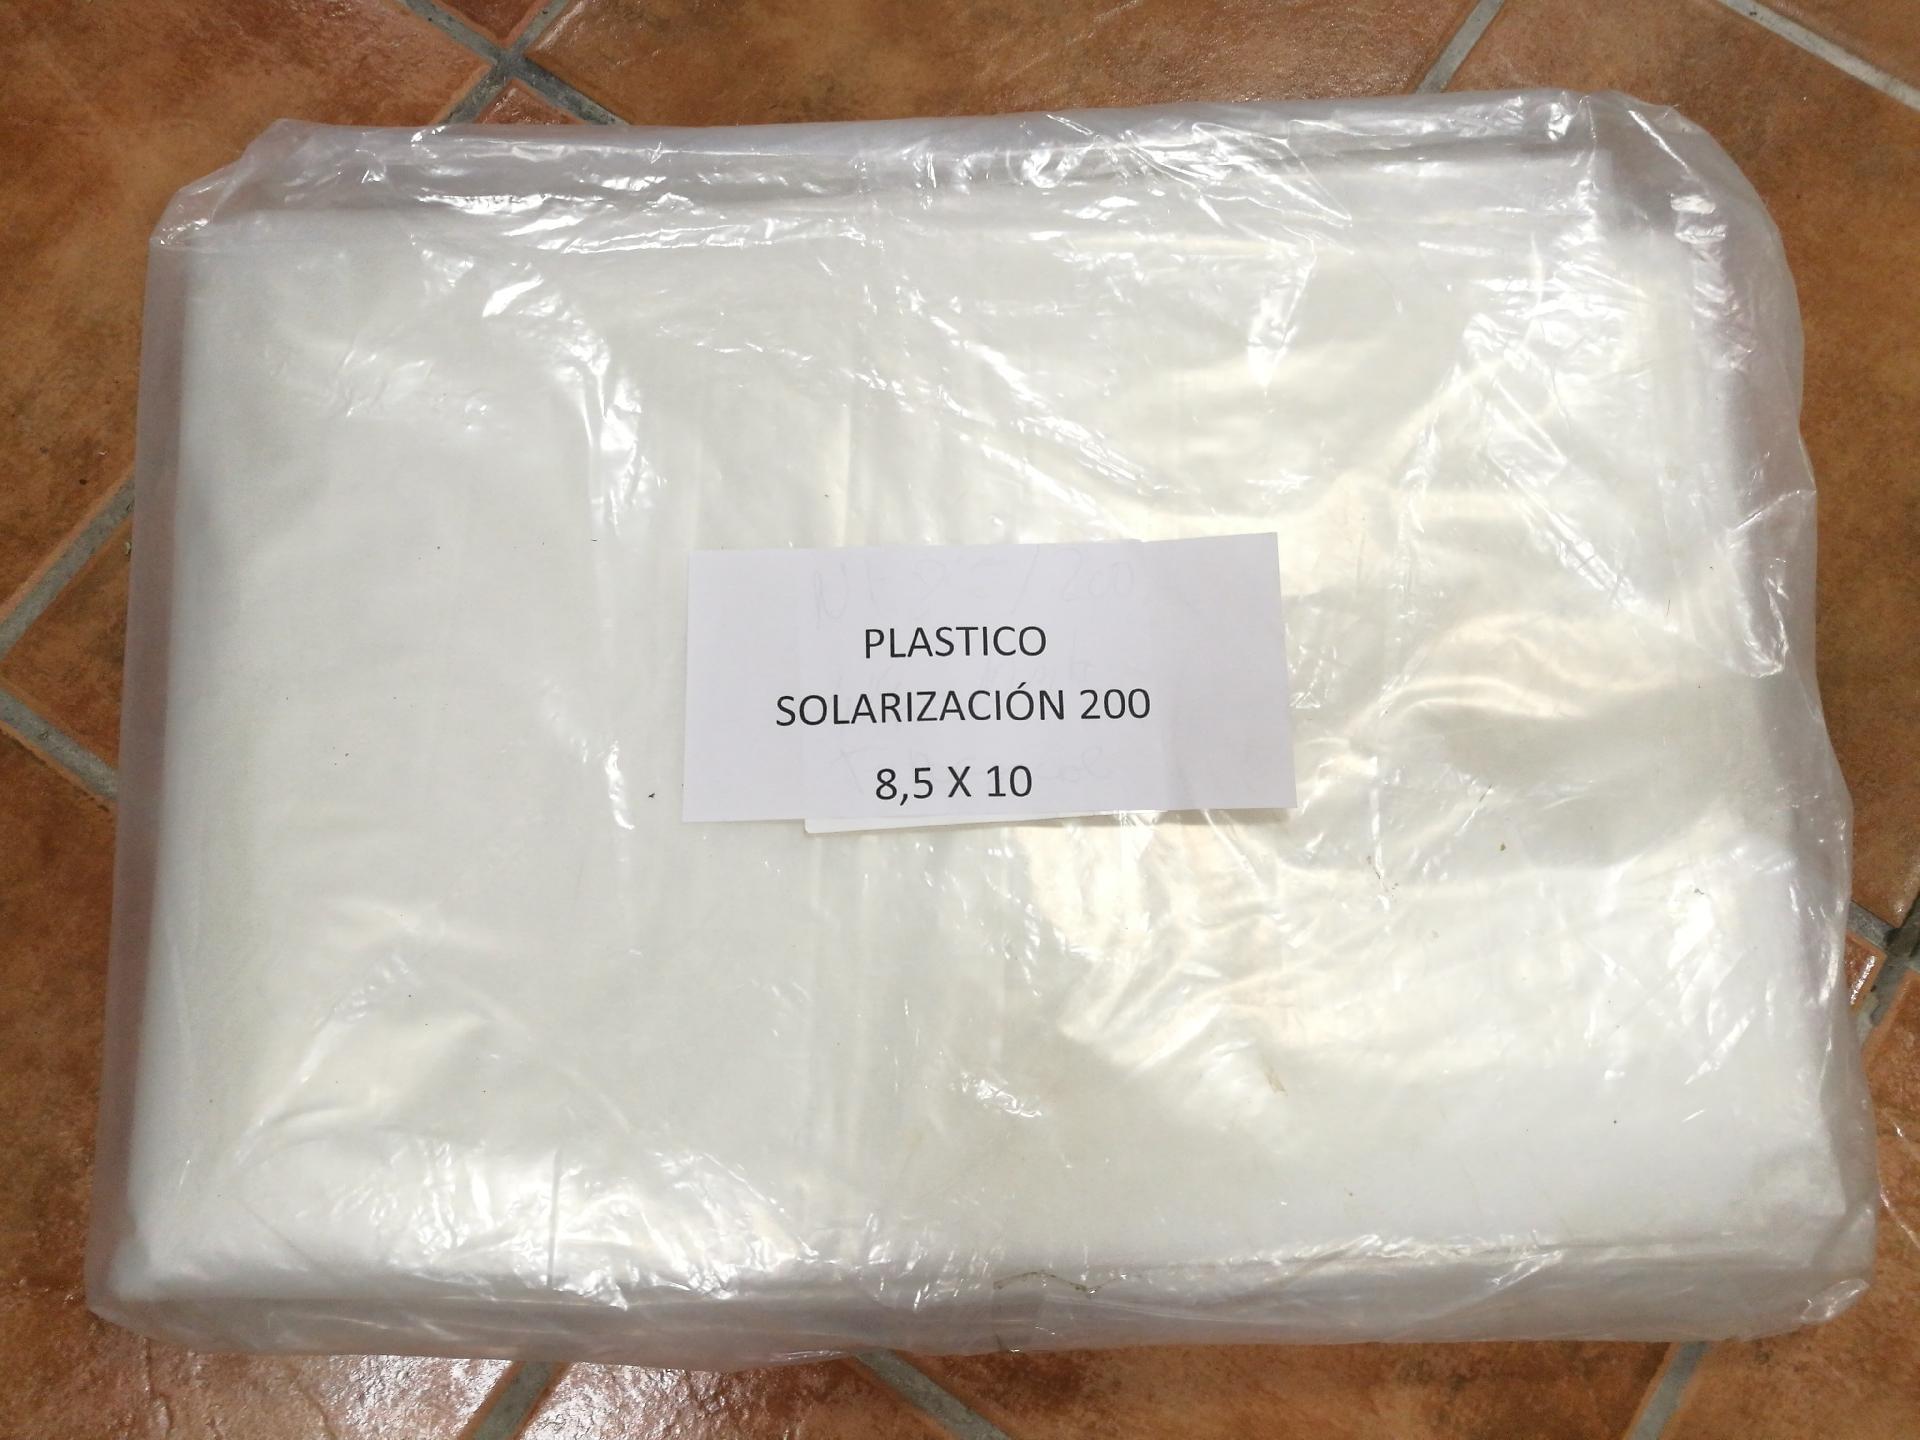 PLASTICO NATURAL SOLARIZACION (200 gg) 8,5x10 METROS